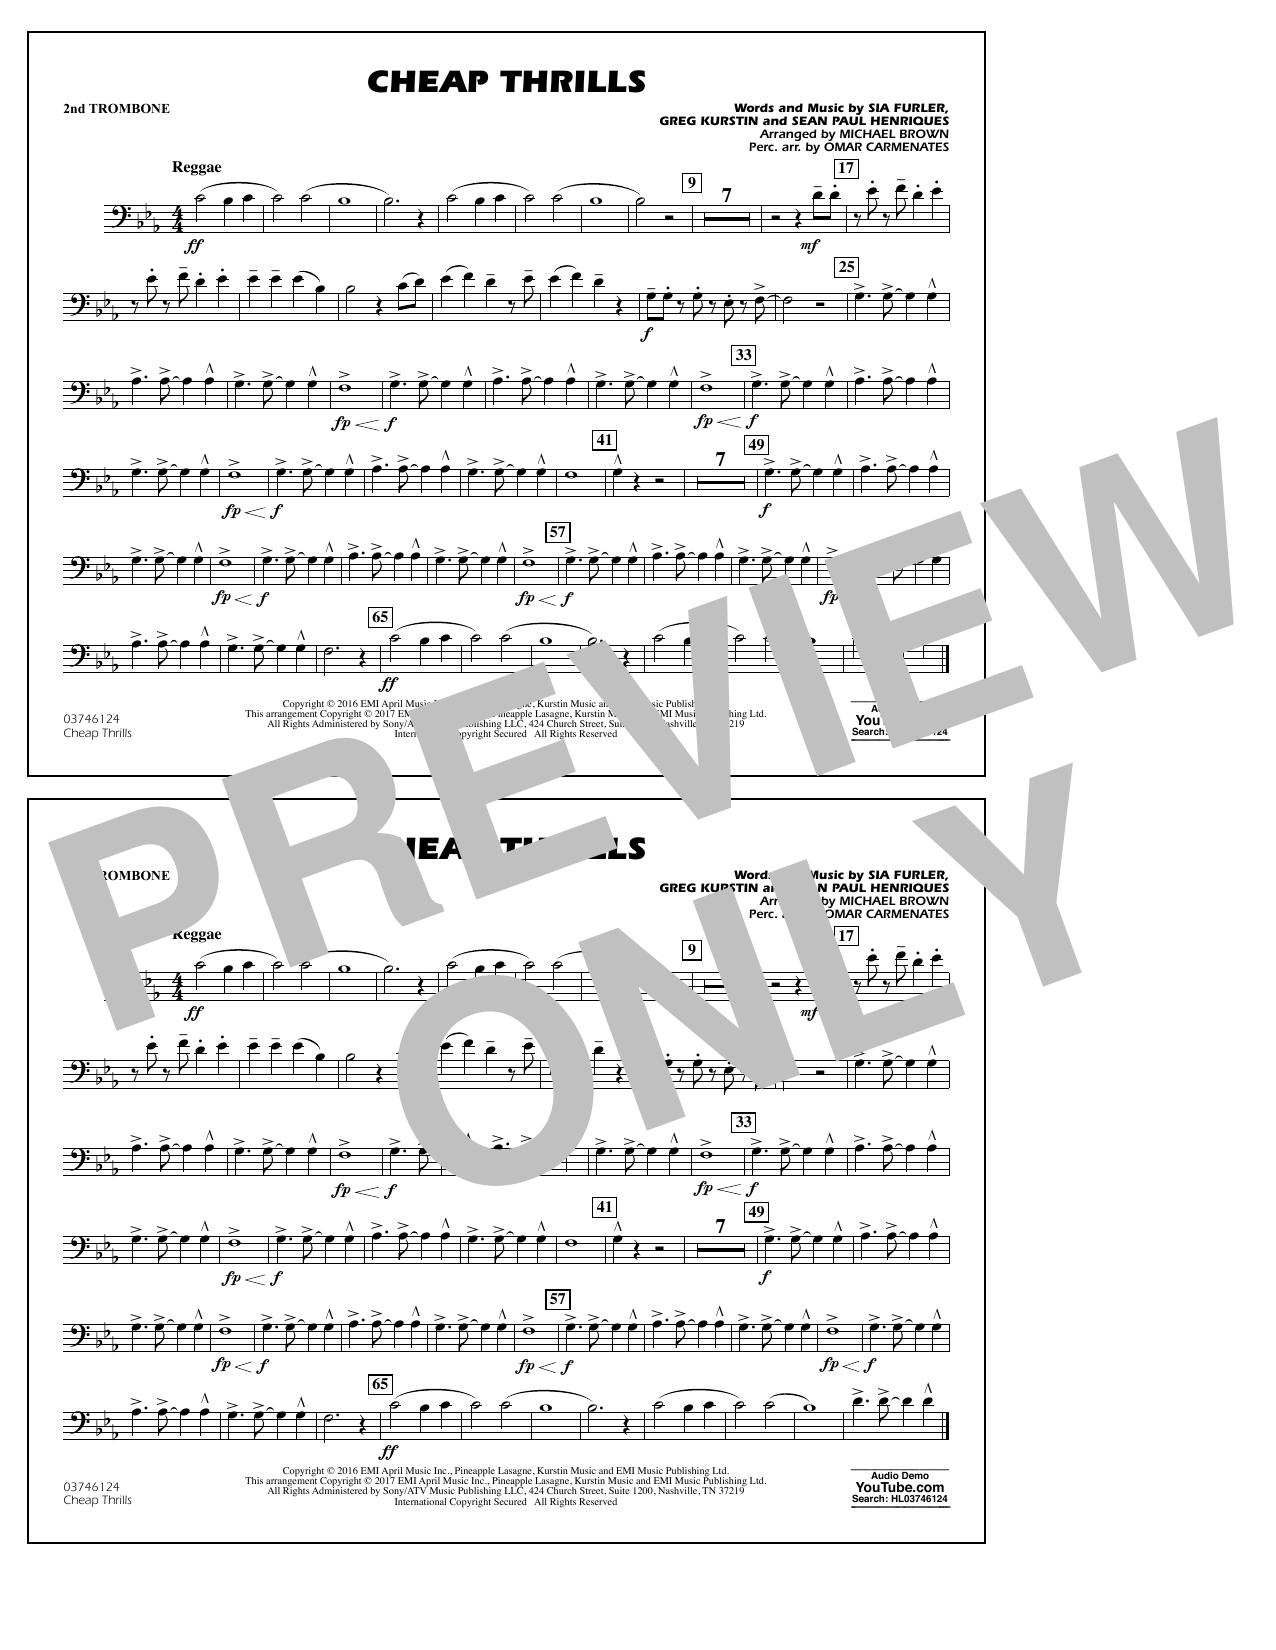 Cheap Thrills - 2nd Trombone Sheet Music